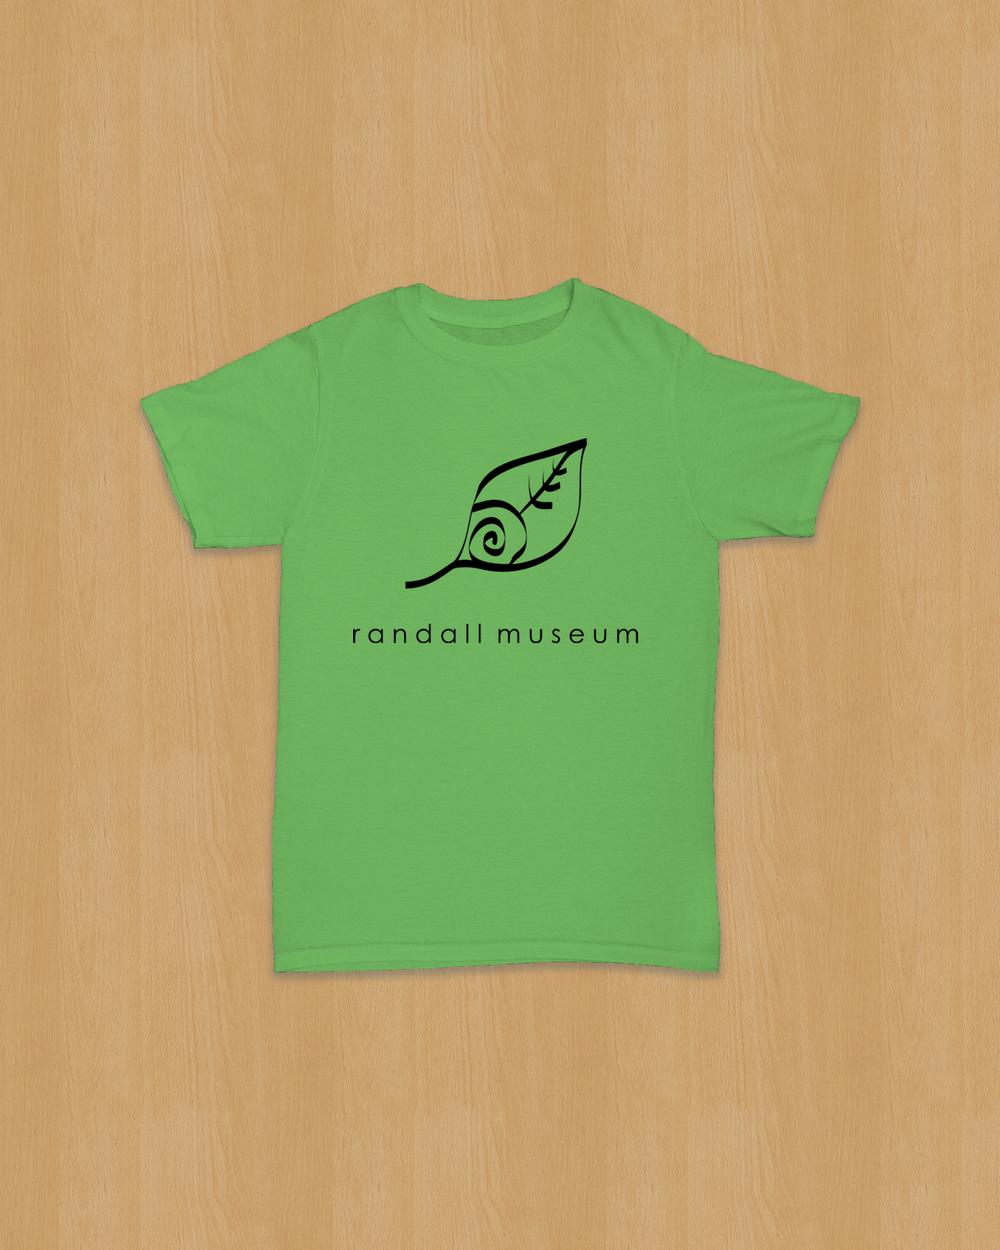 randallmuseum_shirt.png